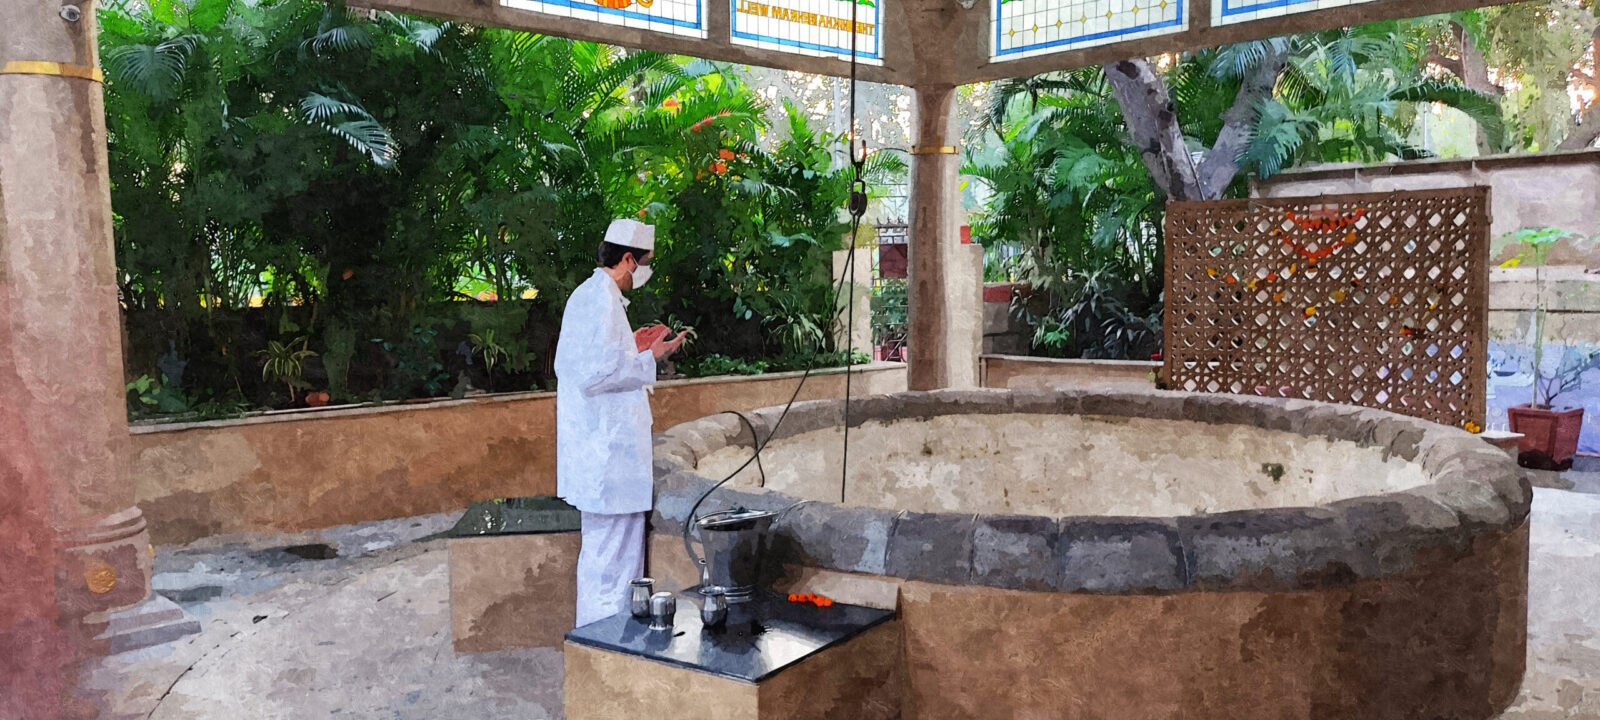 zoroastrian groundwater well parsi culture zoroastrianism